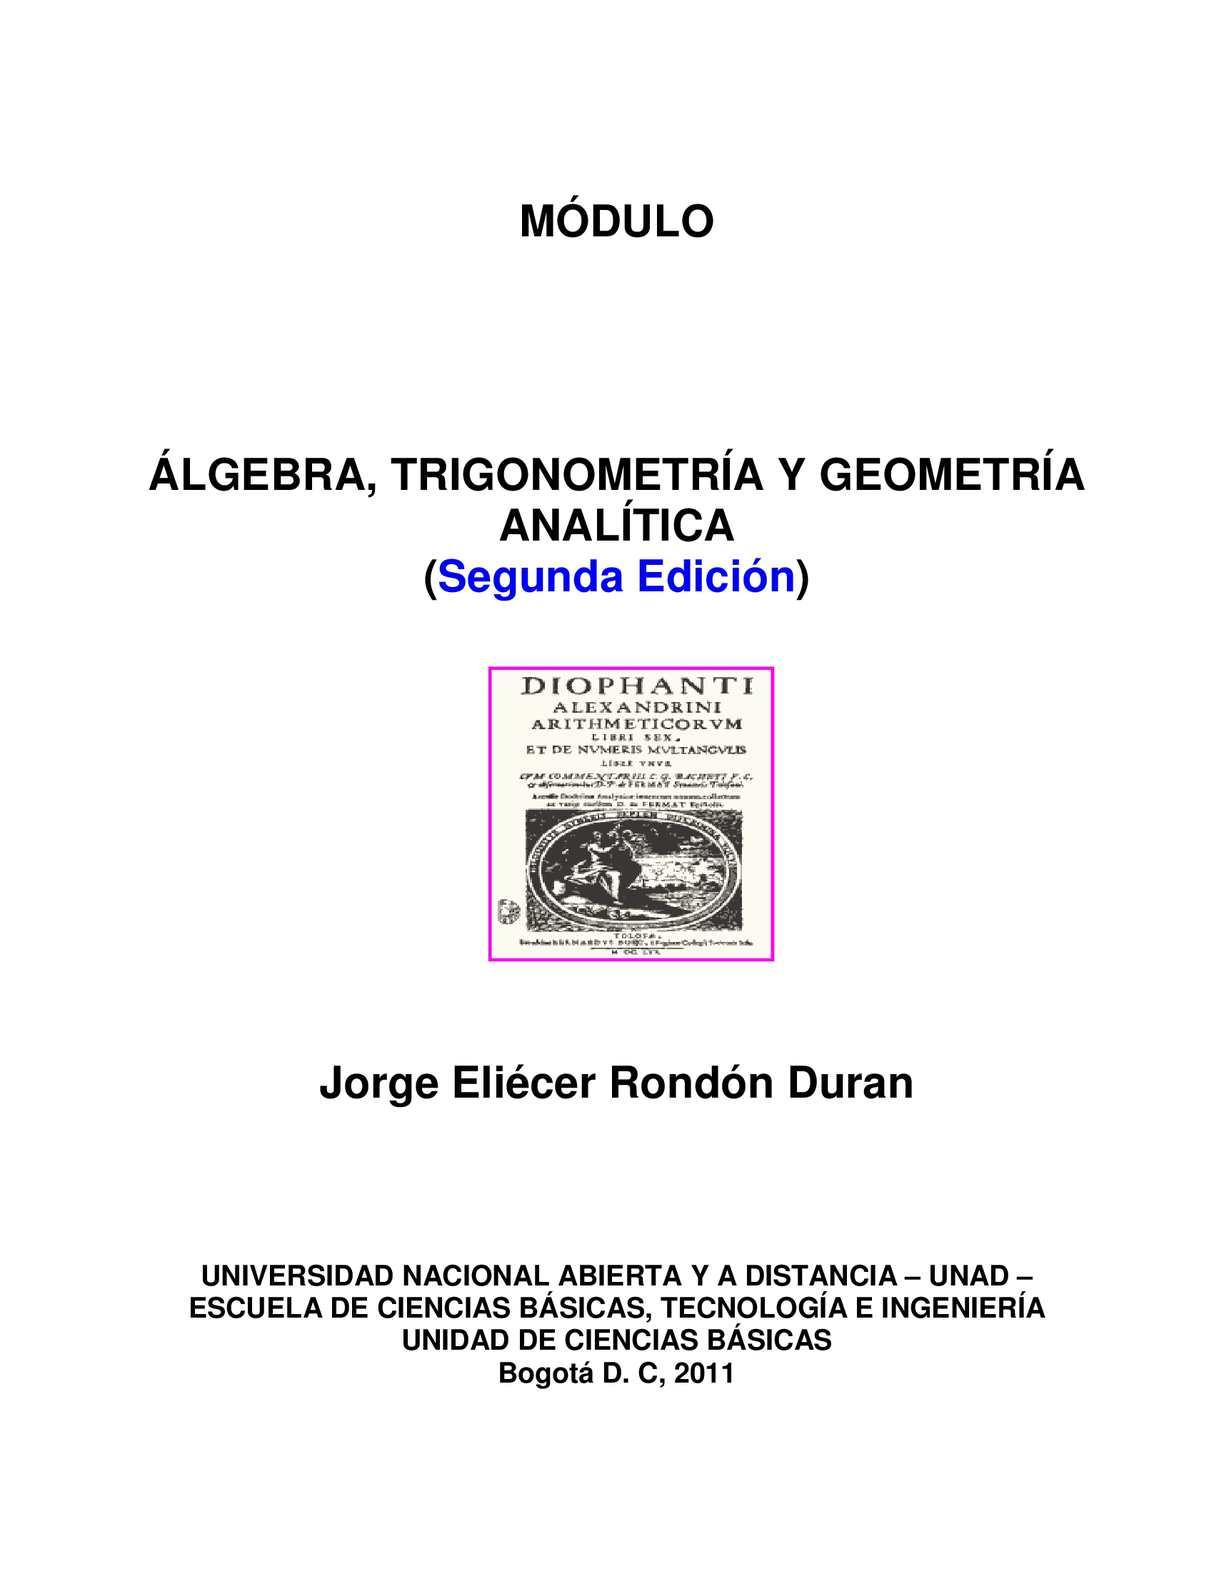 Calaméo - Modulo Algebra Trigonometria Y Geometria Analitica 2011